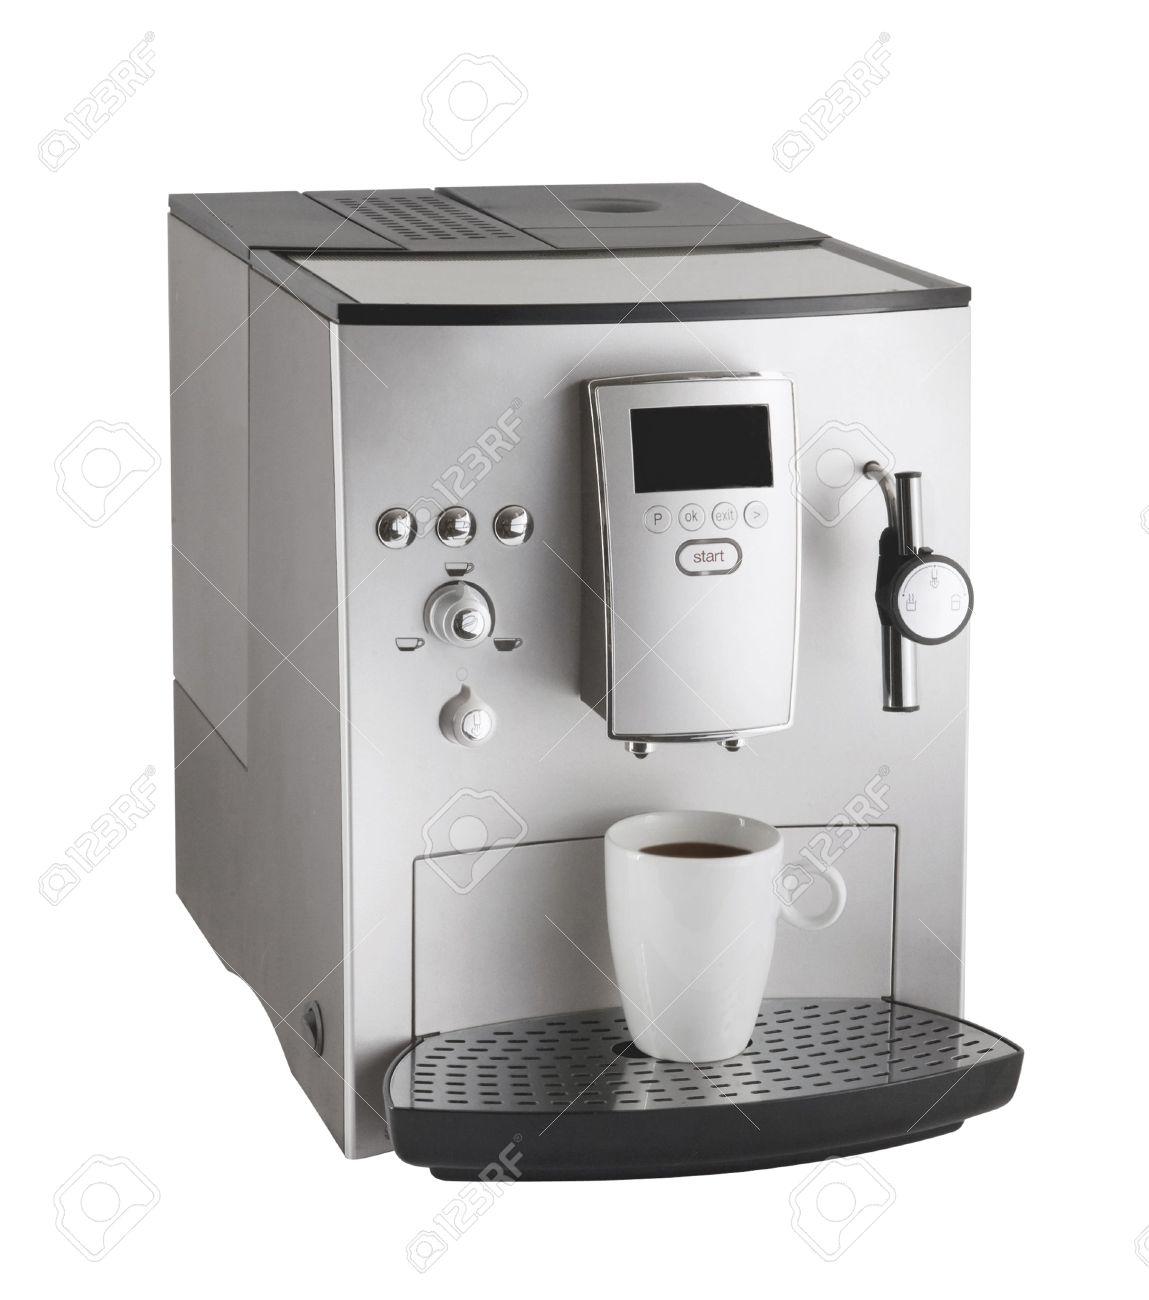 Expresso coffee machine Stock Photo - 14727805